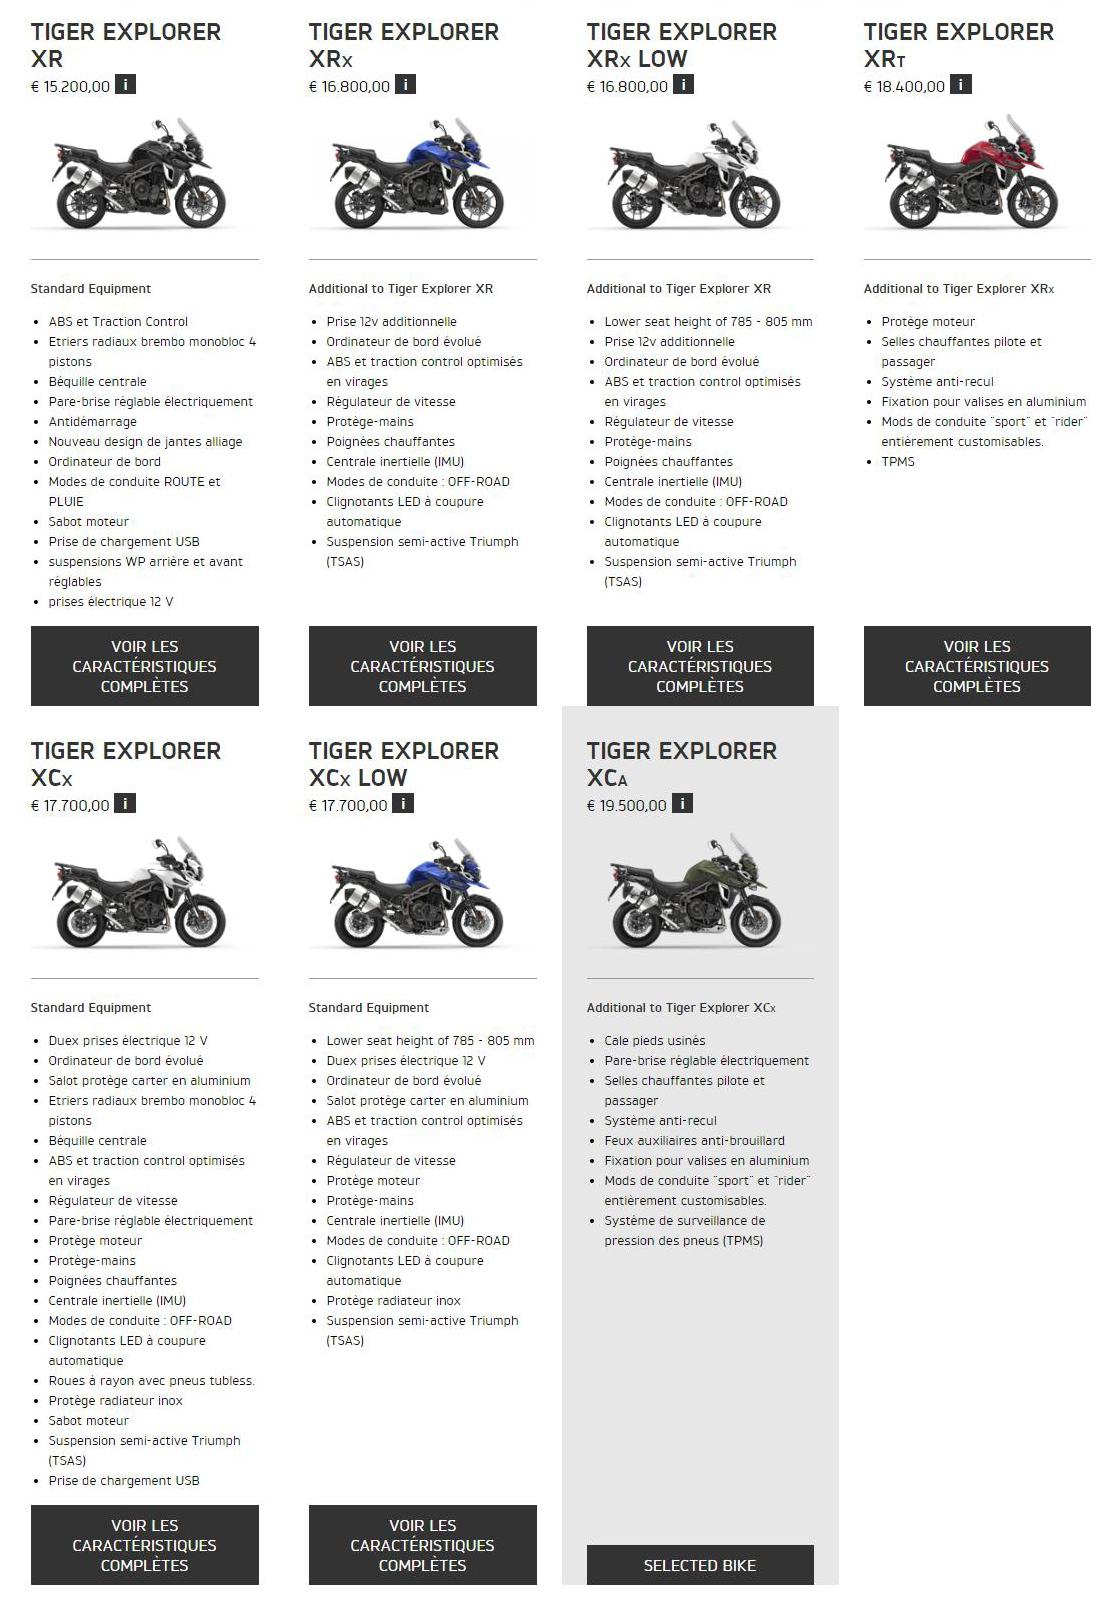 Tiger-Explorer-XCA---Triumph-Motorcycles